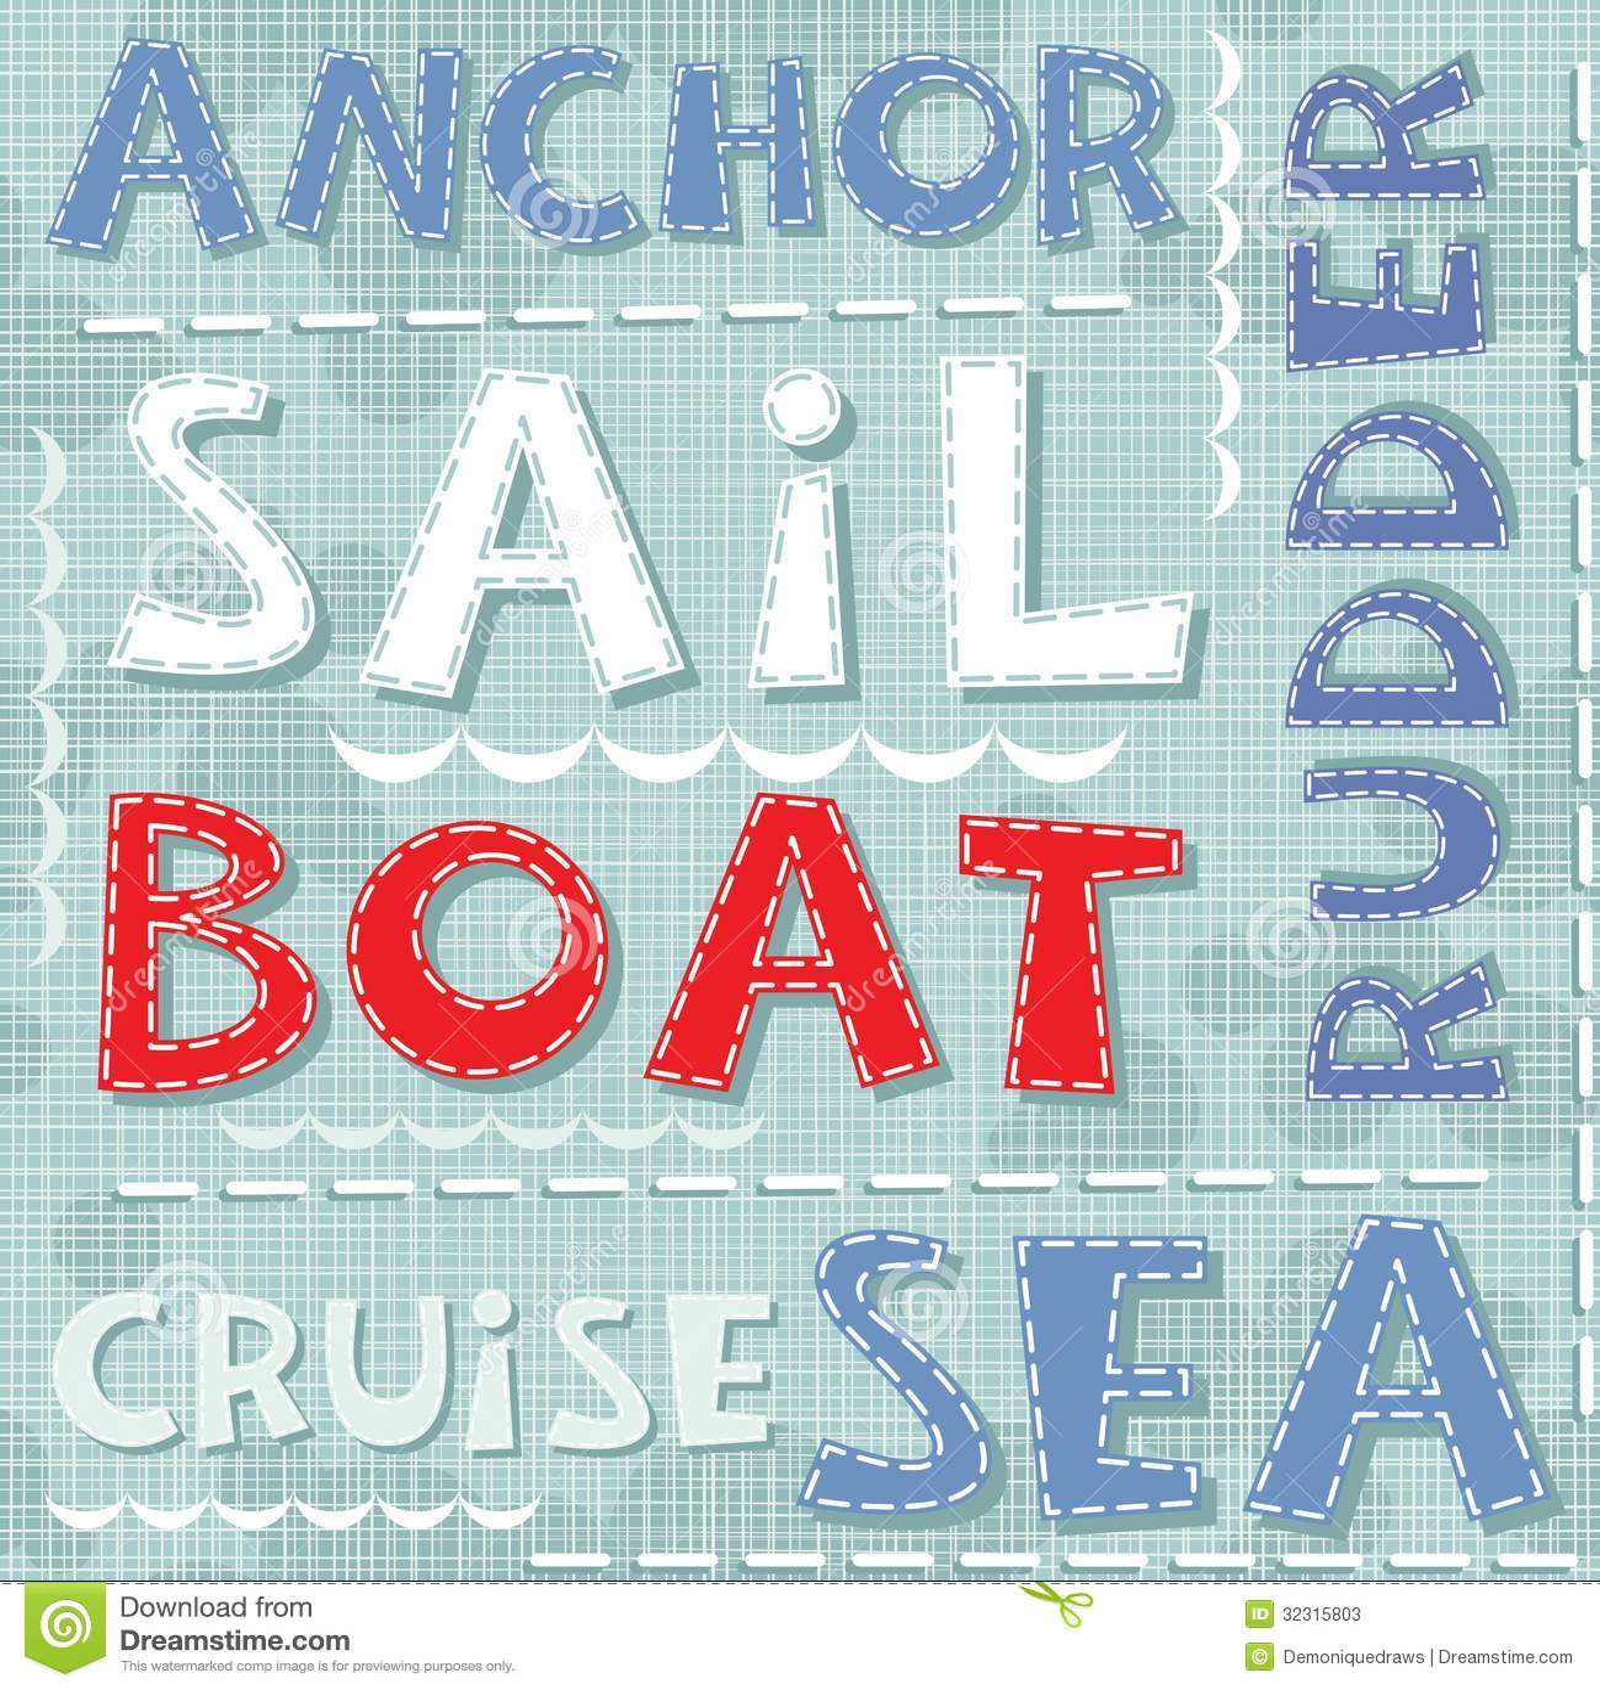 Anchor sea sail boat cruise blue seamless pattern